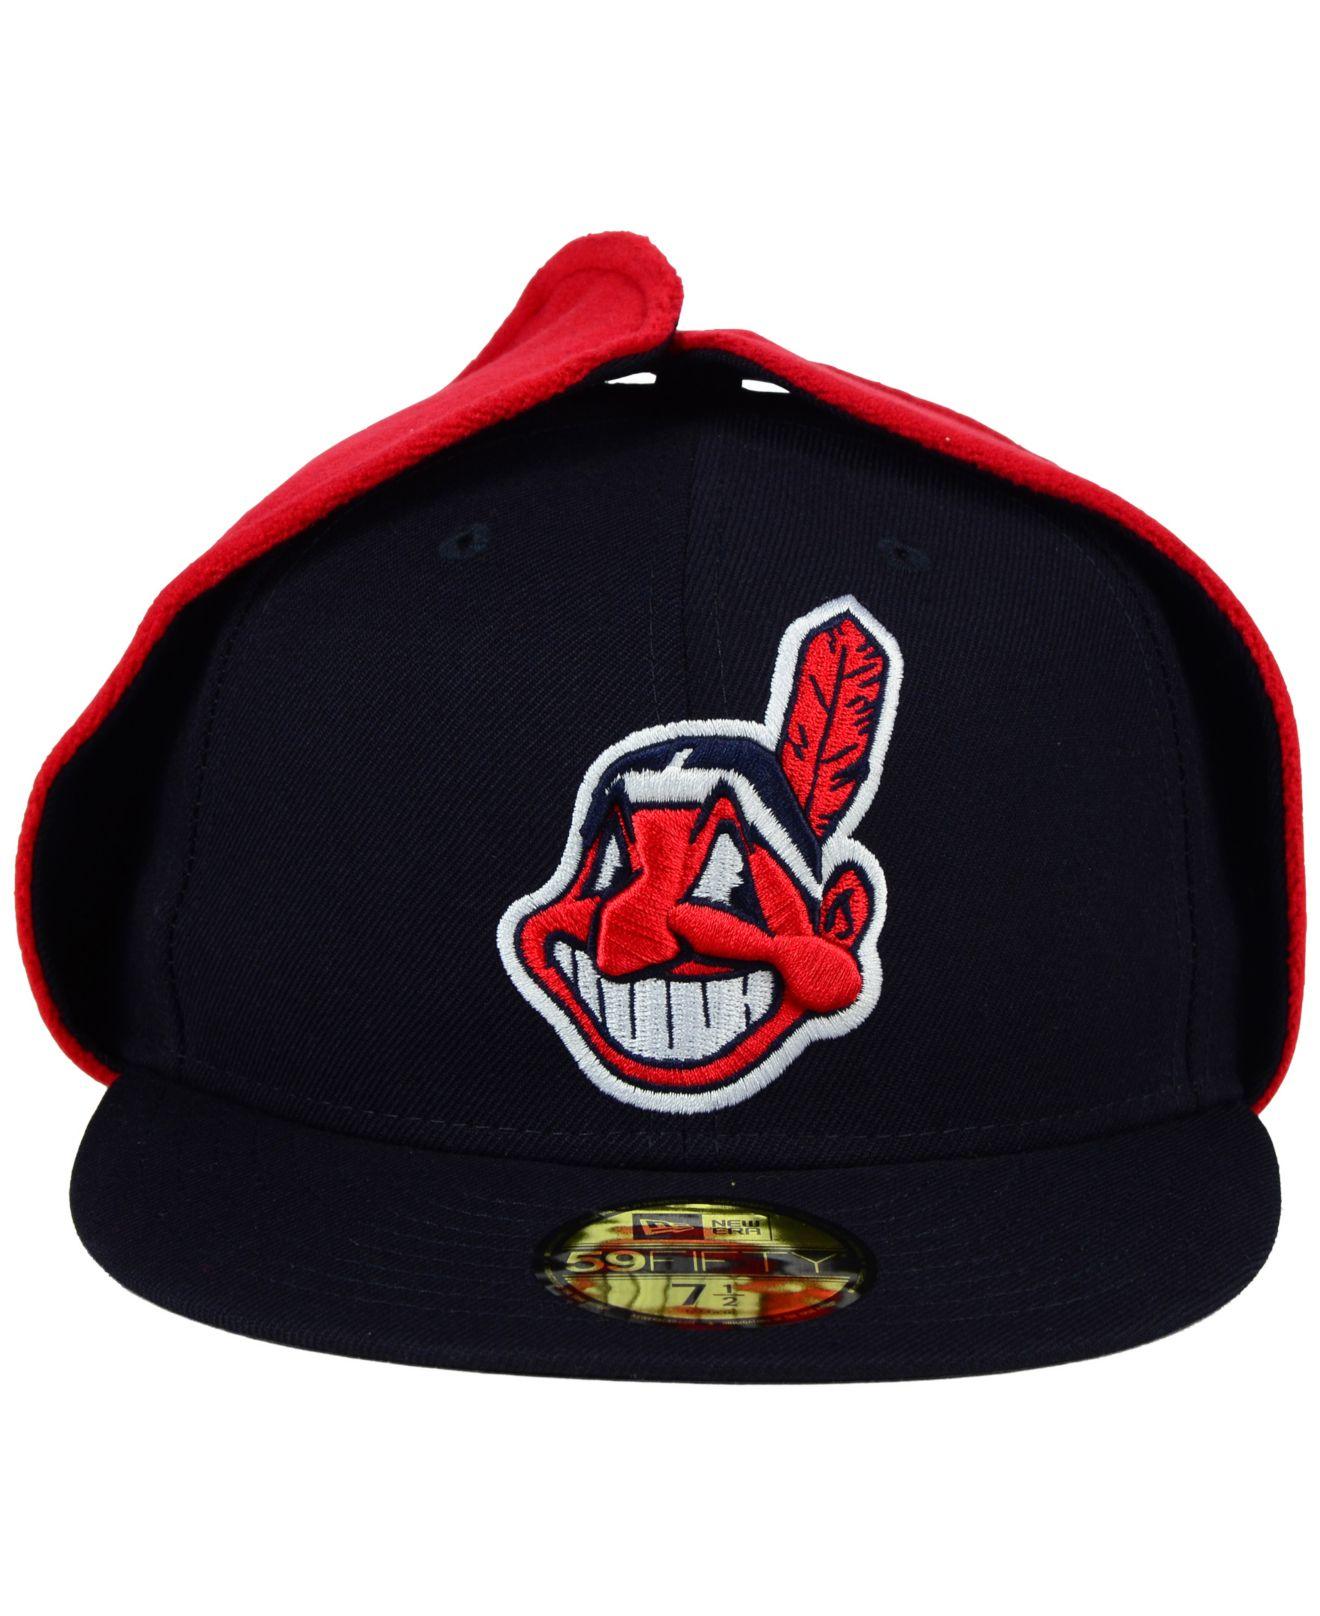 58c568d256b Lyst - KTZ Cleveland Indians Dog Ear 59fifty Cap in Blue for Men